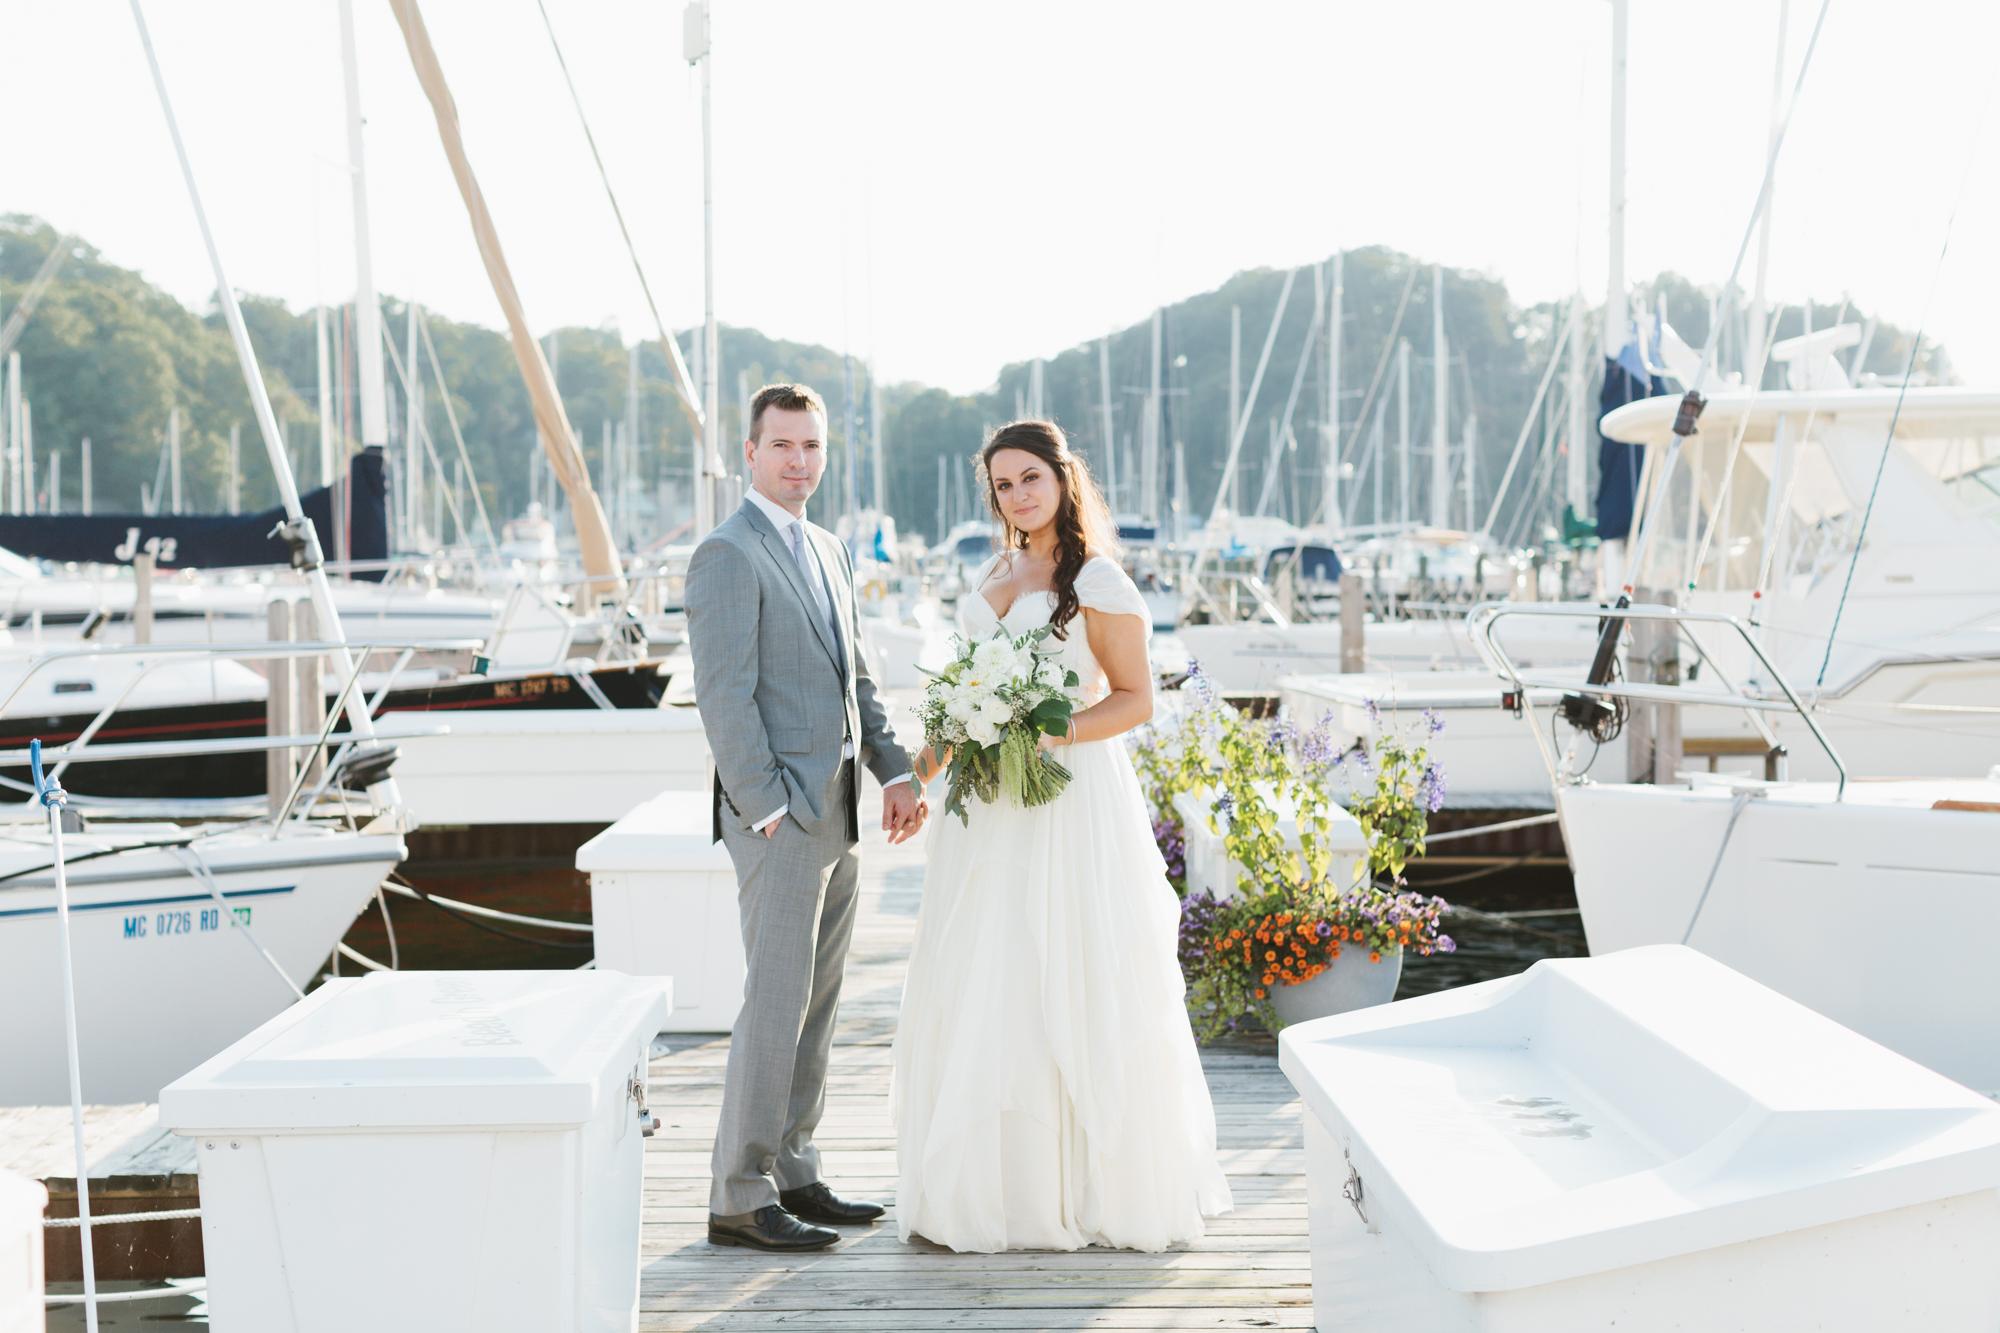 Holland Lake Michigan Wedding Photographer Mae Stier-058.jpg